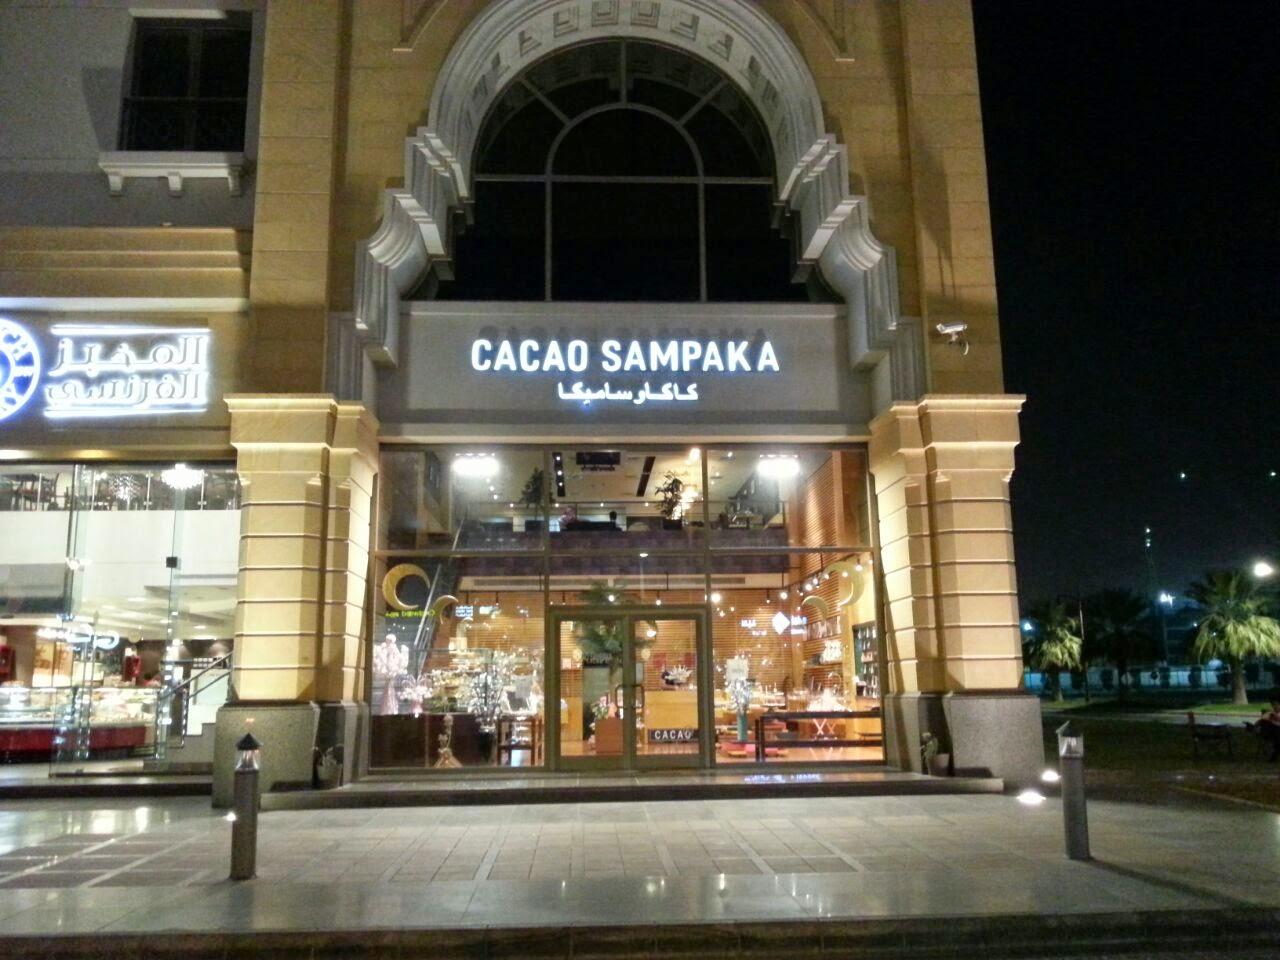 Cacao Sampaka Al-Khobar, Saudi Arabia blogging